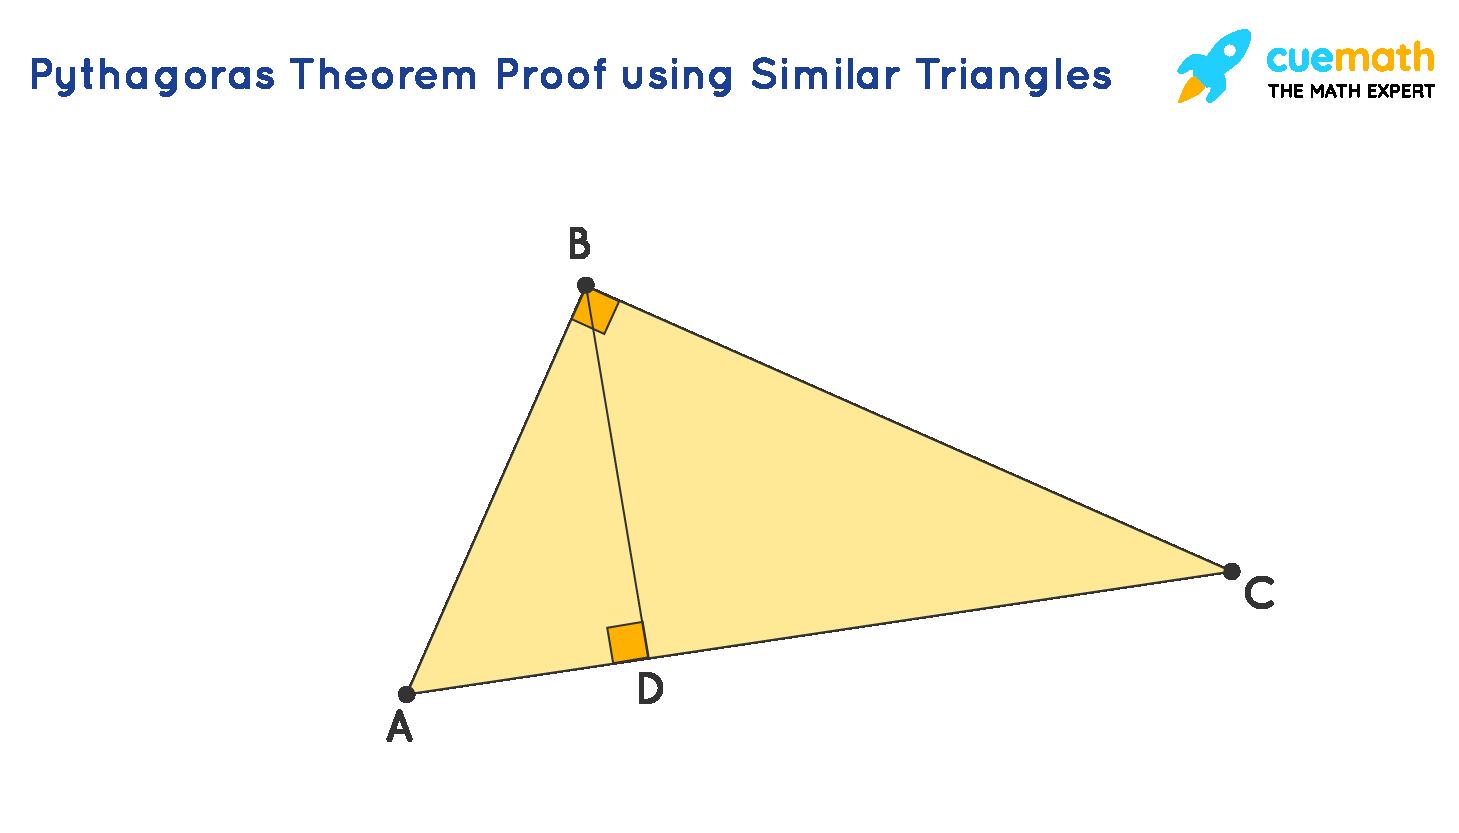 Pythagoras theorem proof using similar triangles